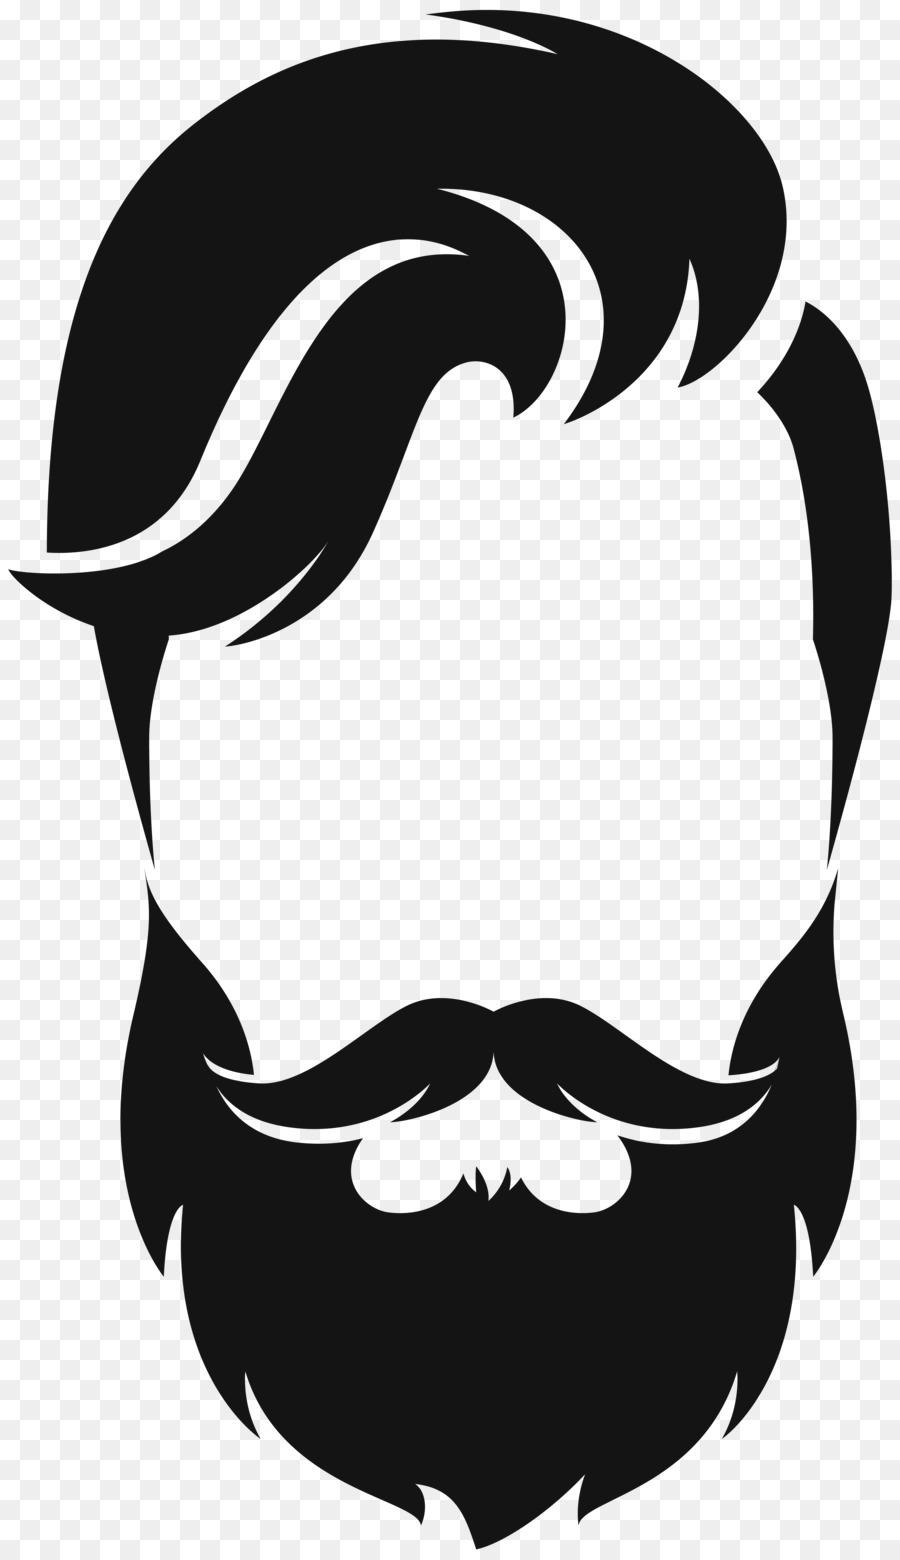 Silhouette moustache clip art. Beard clipart real